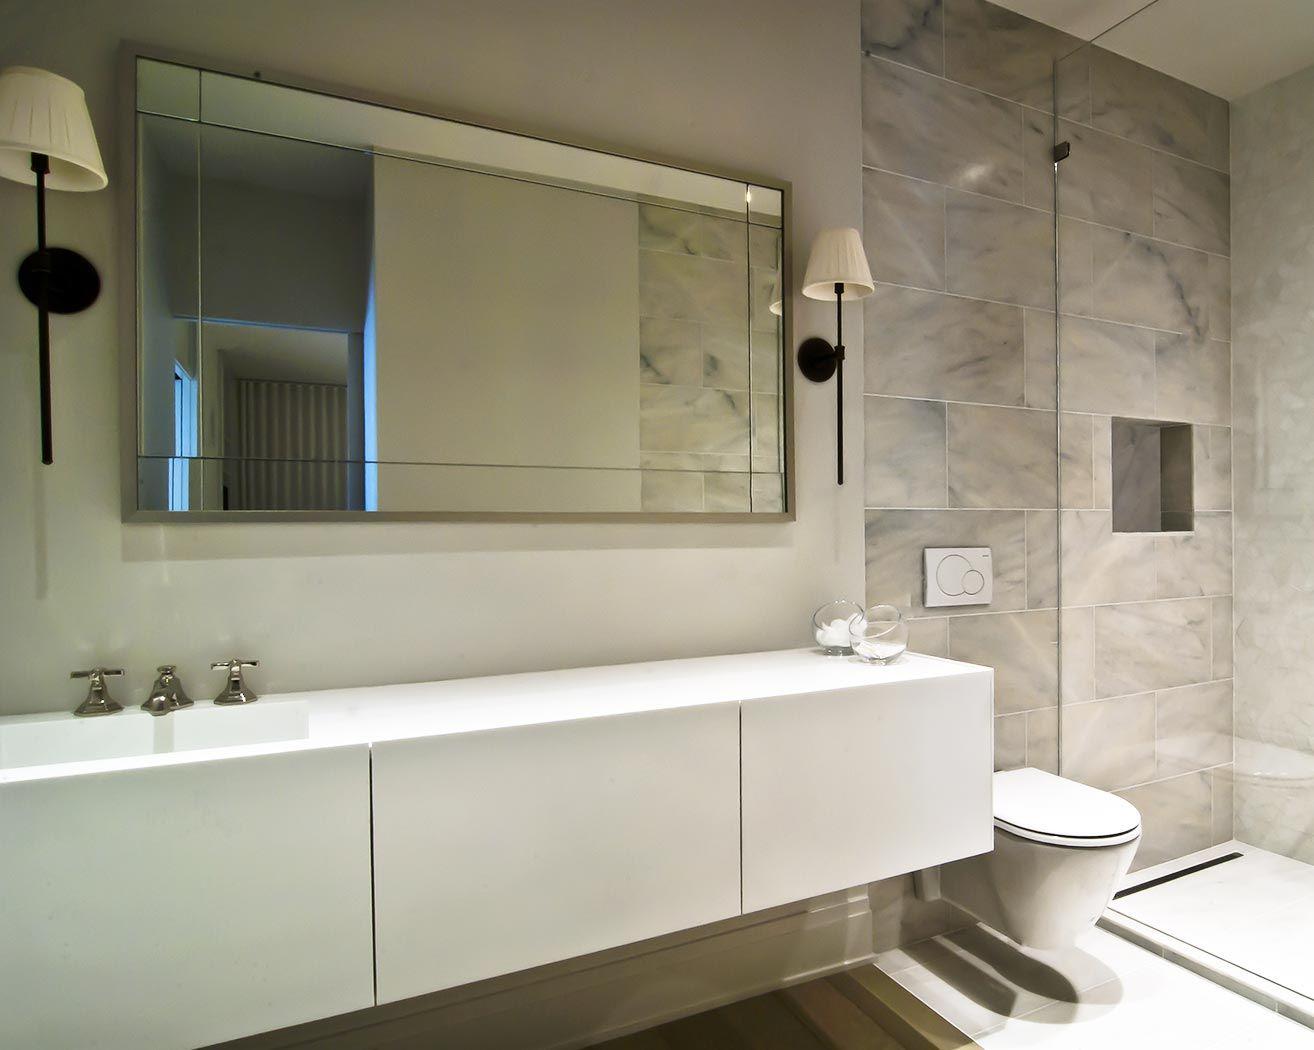 kara mann design | design | bathrooms | pinterest | bath, bathroom